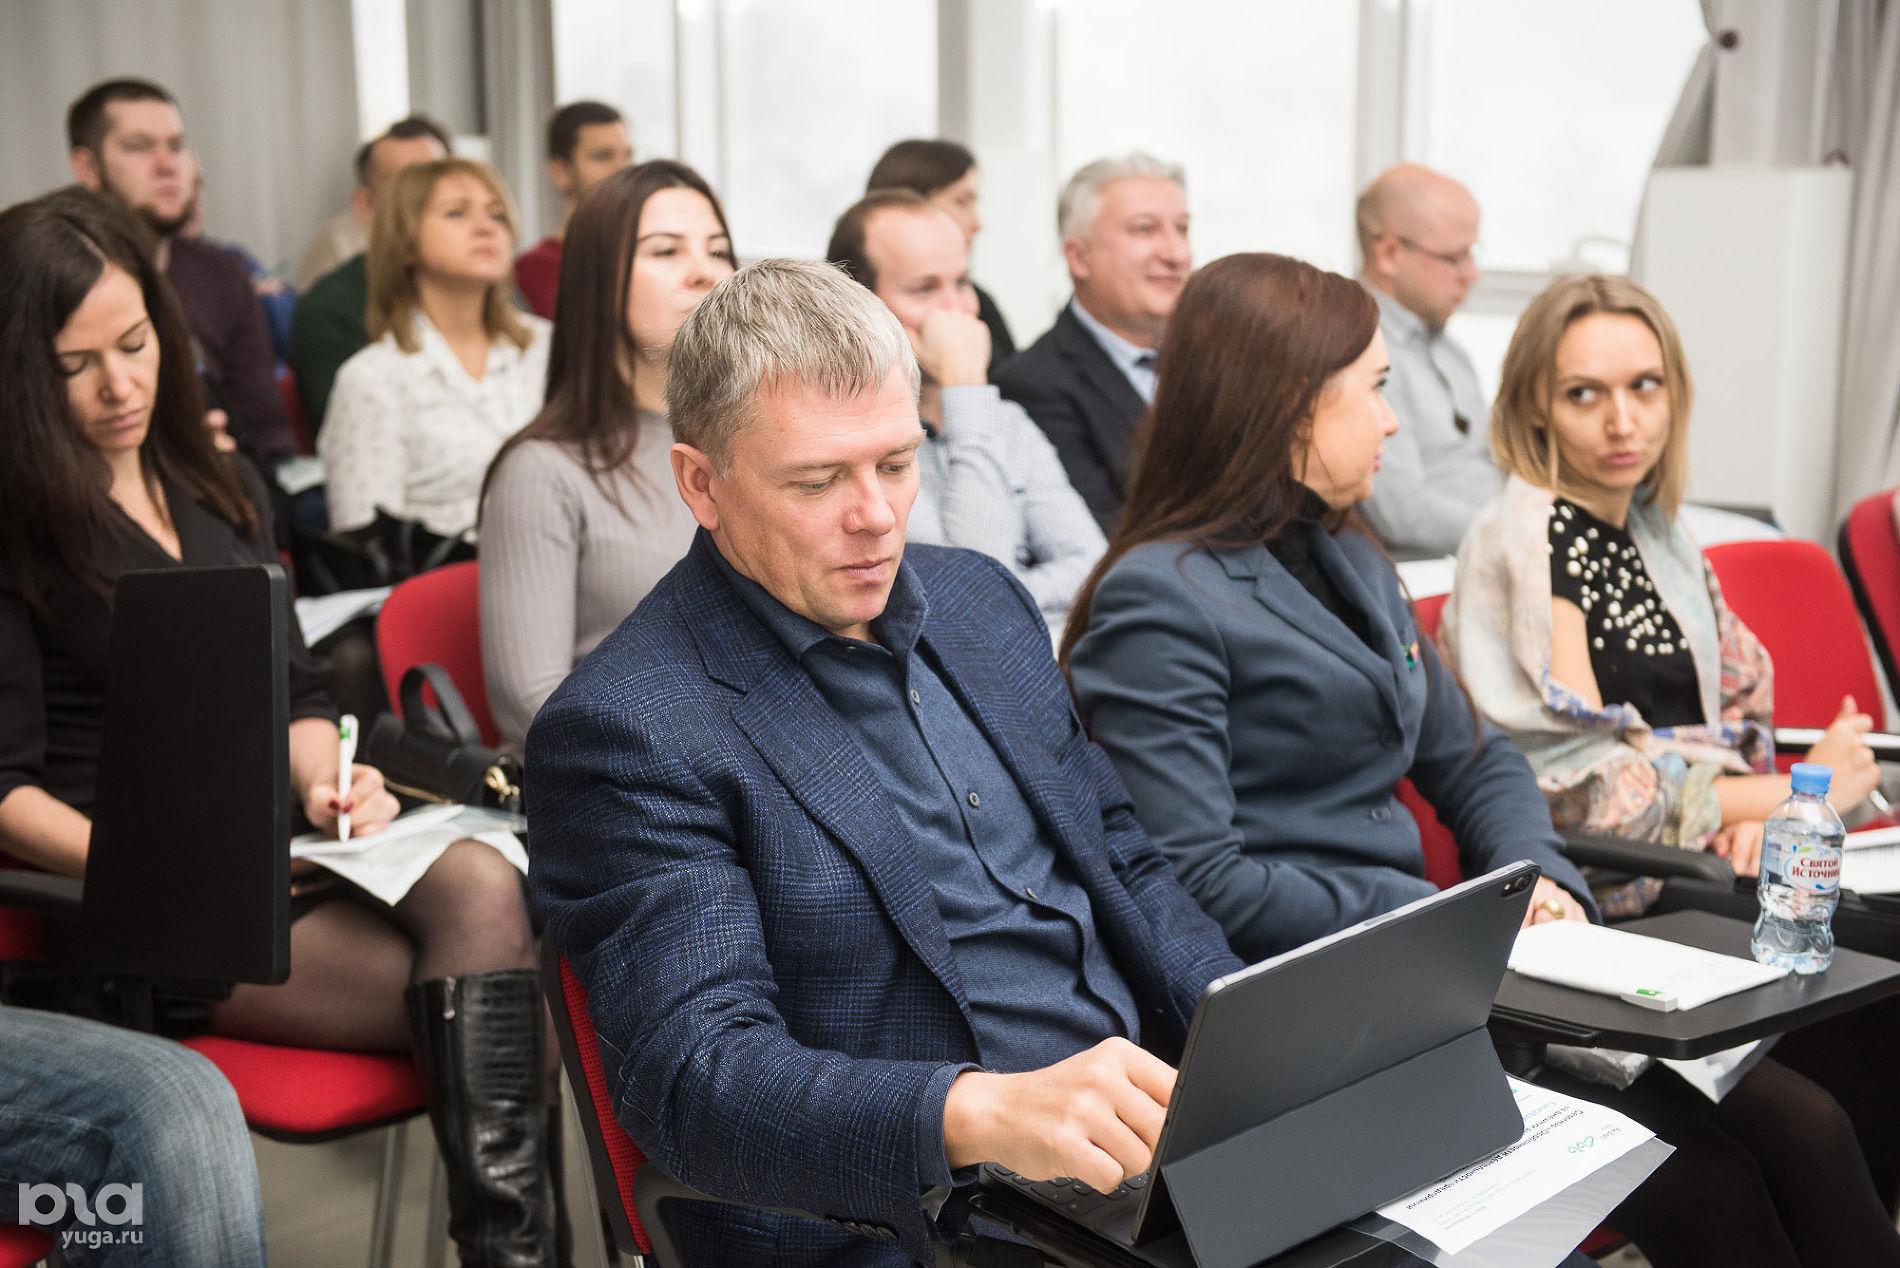 Семинар Ак Барс Банка «Особенности деятельности предприятий на внешних рынках в условиях санкций»